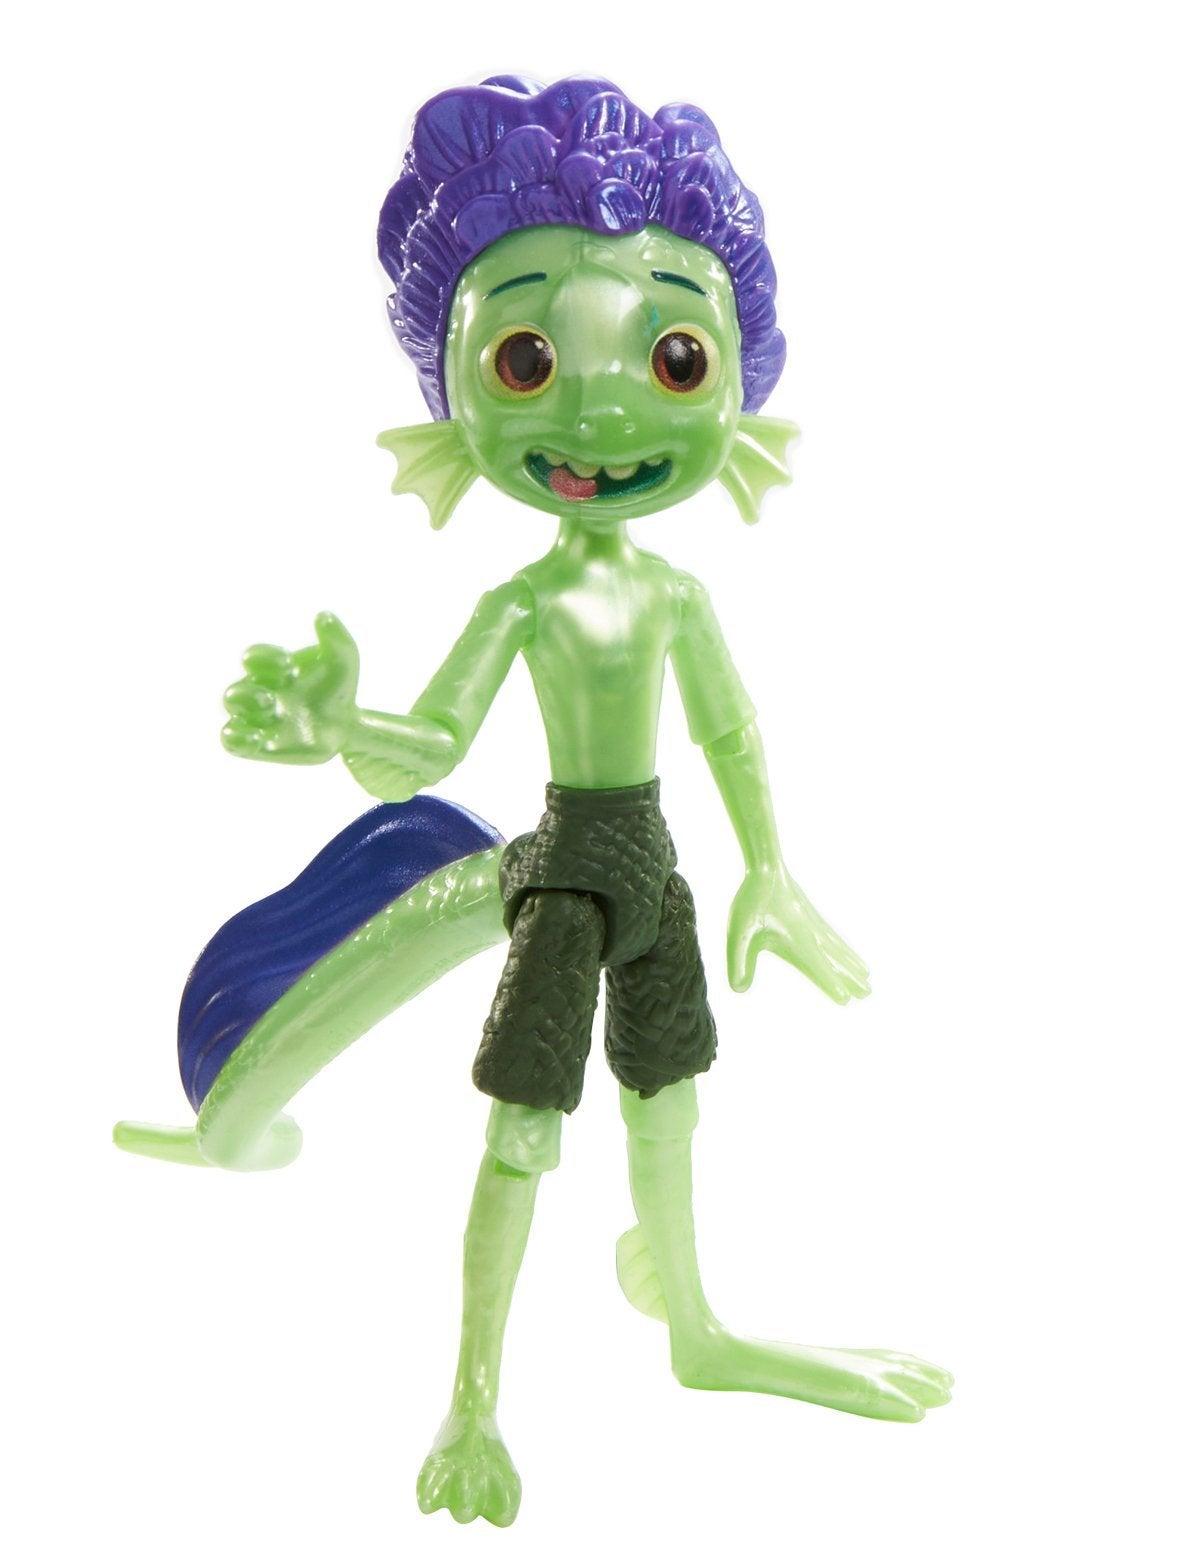 Disney Pixar Luca Alberto Scorfano Figure (HBL41)